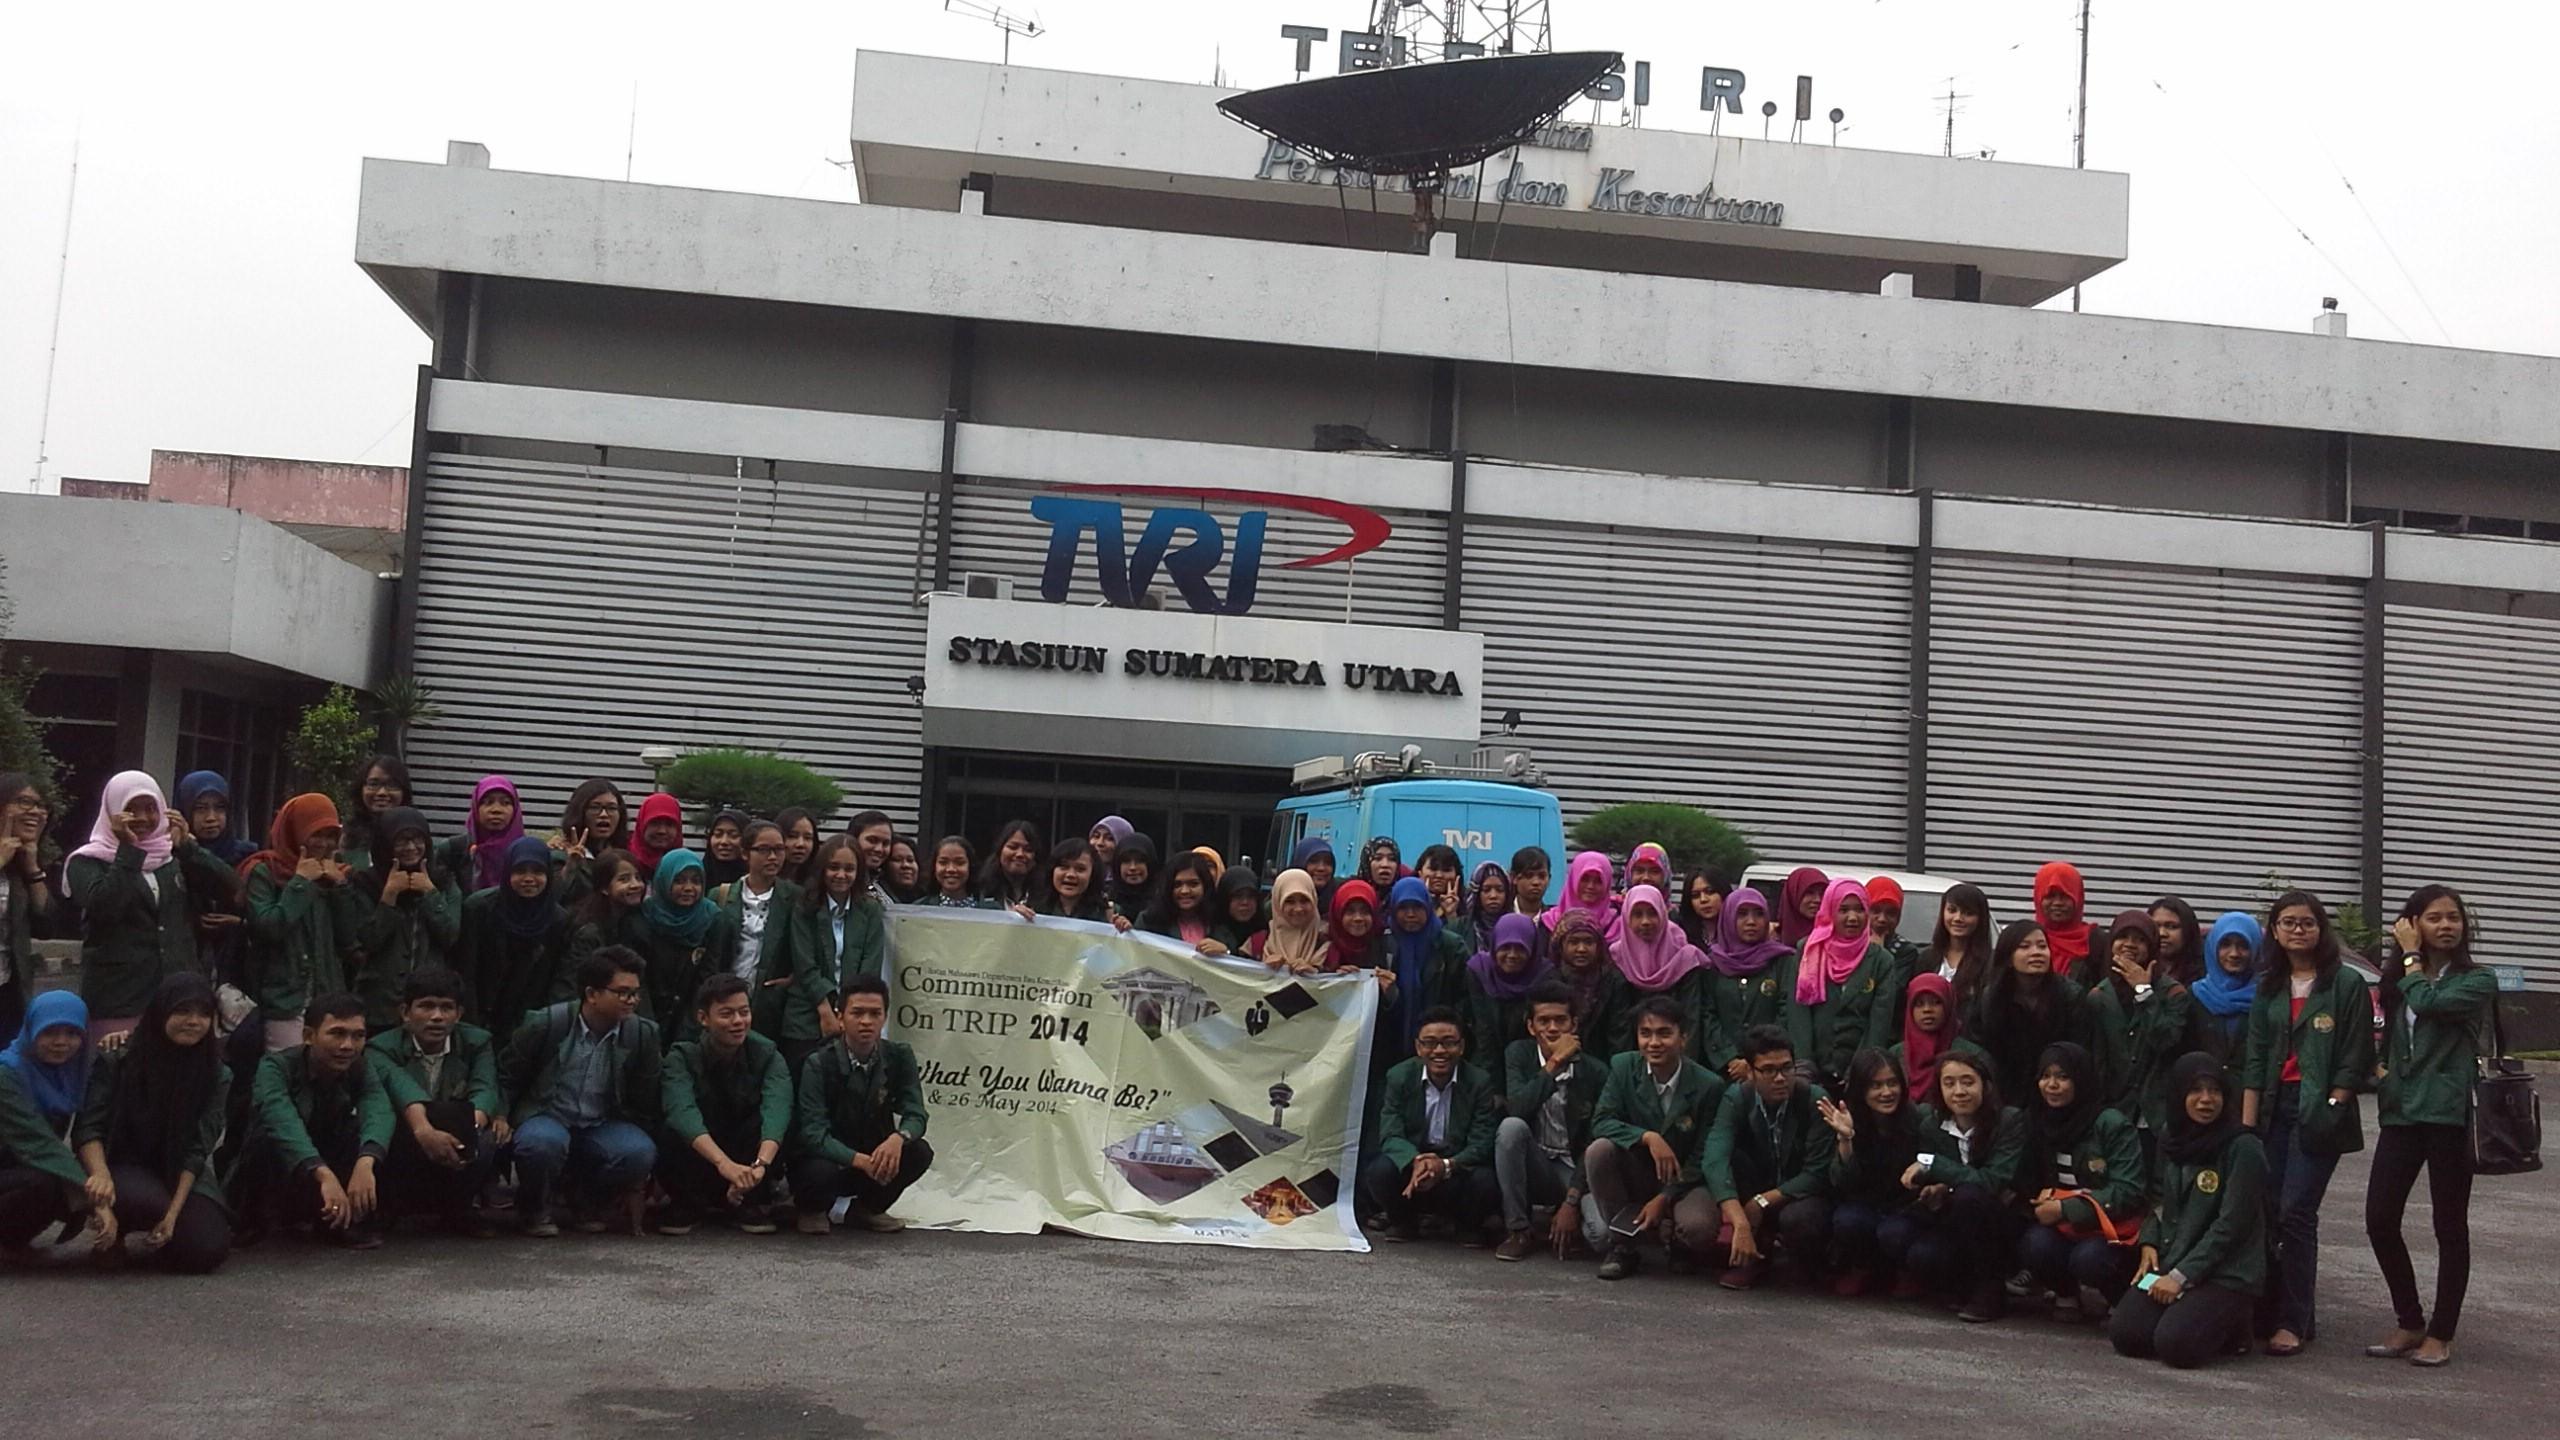 Mahasiswa Ilmu Komunikasi - Usu berfoto bersama di depan Gedung Stasiun Tvri Sumatra Utara (26/05)